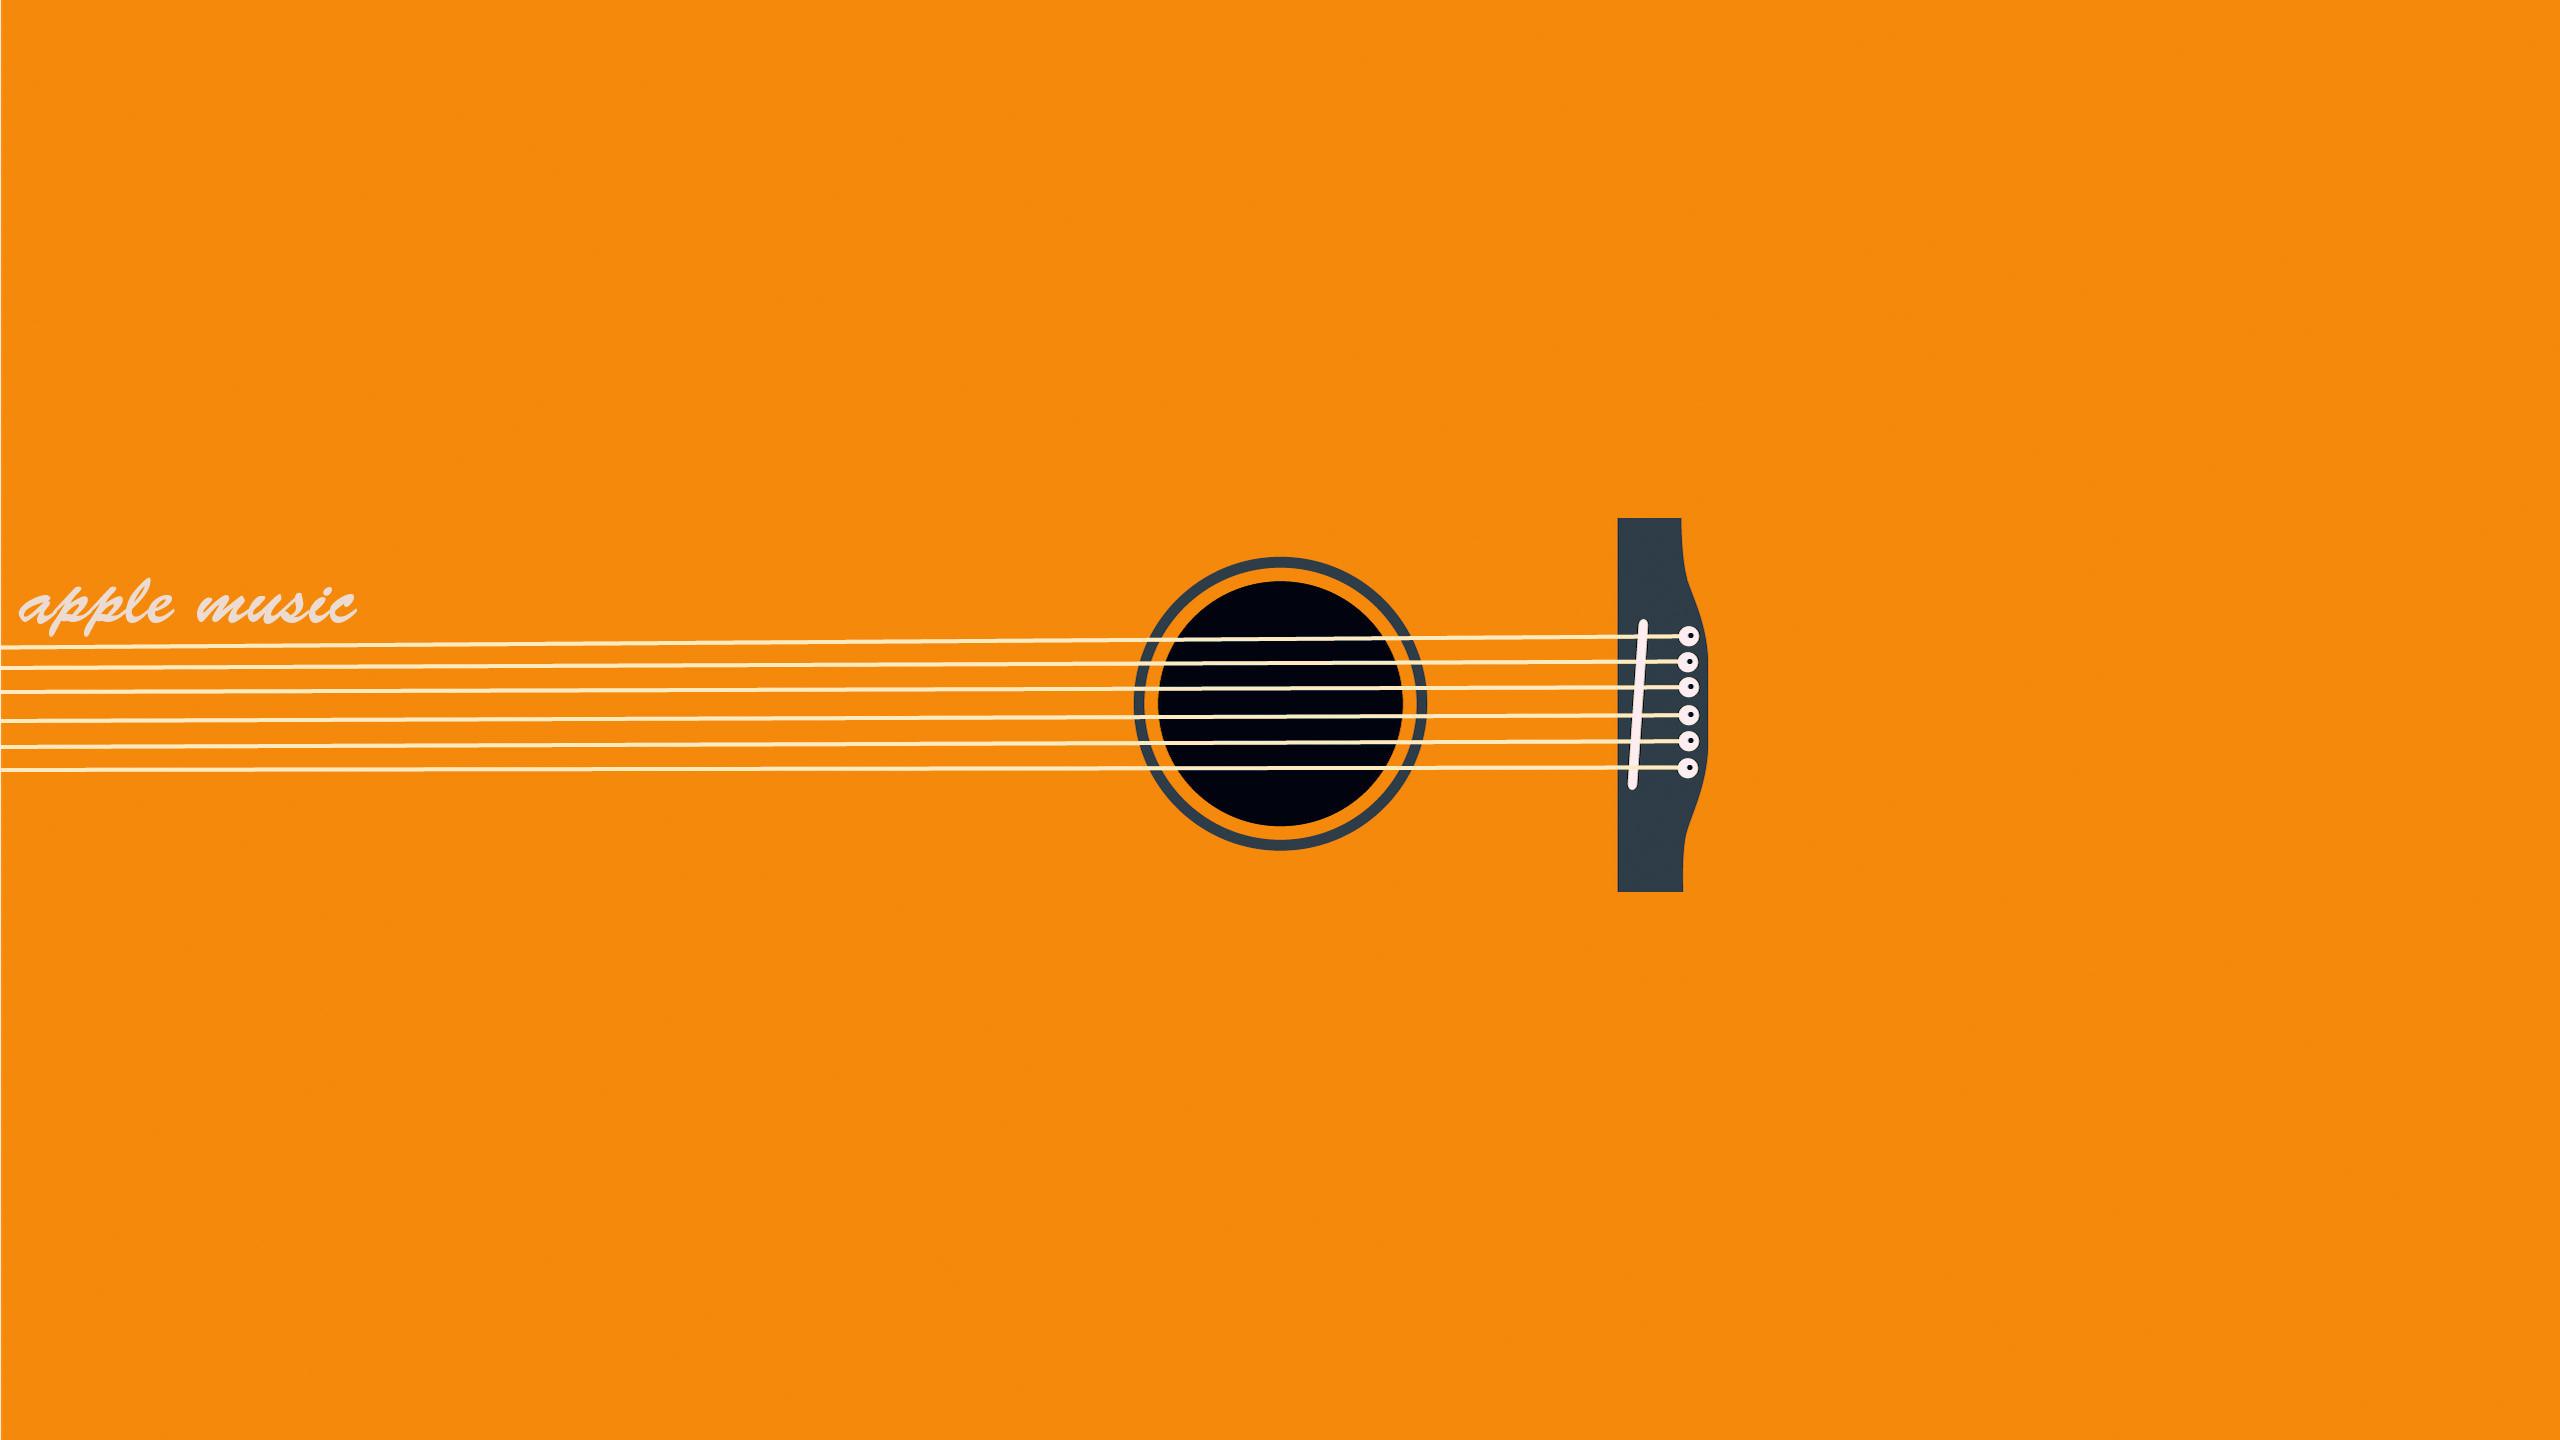 … clical music wallpaper top 47 quality cool clical music …